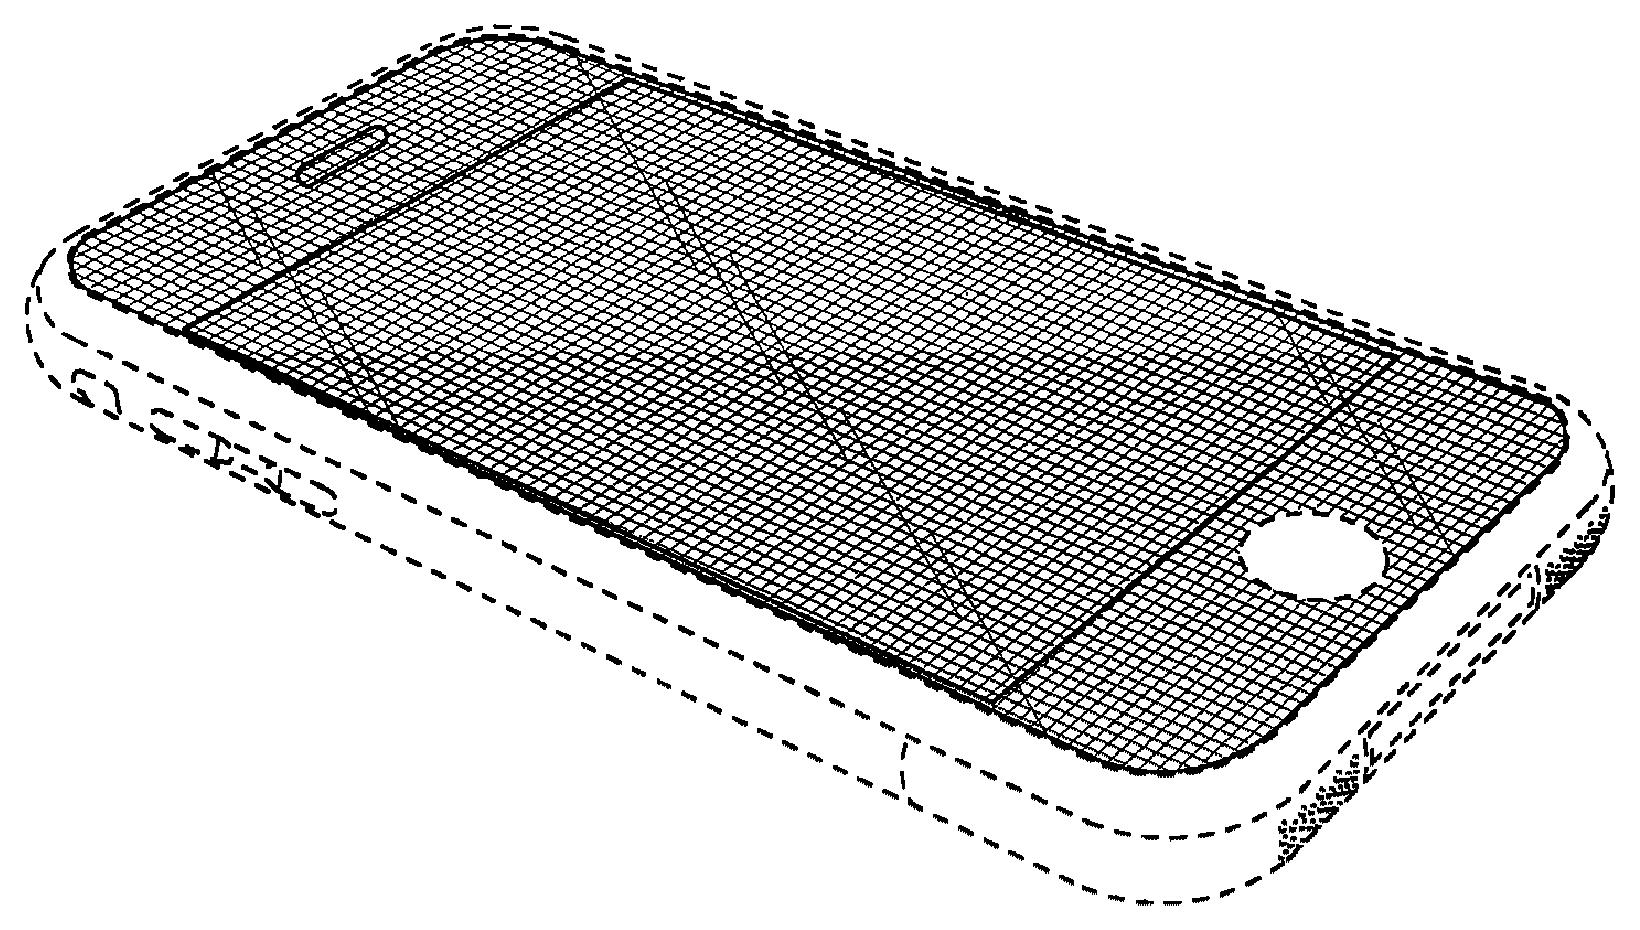 08141914-photo-brevet-d-677-design-de-l-iphone